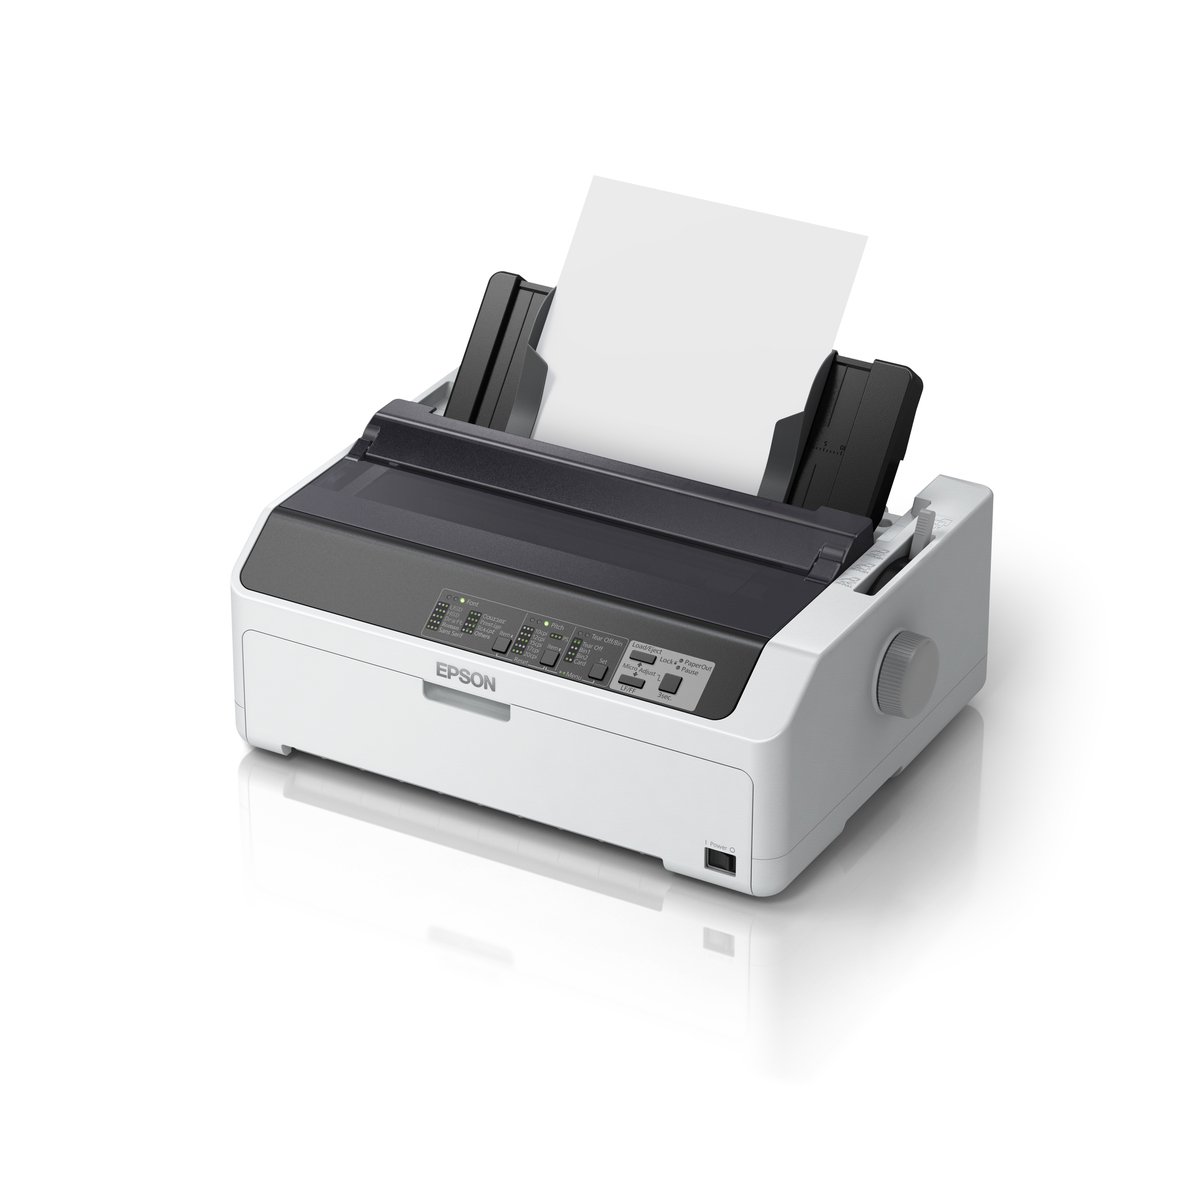 epson m200 scanner error see your documentation